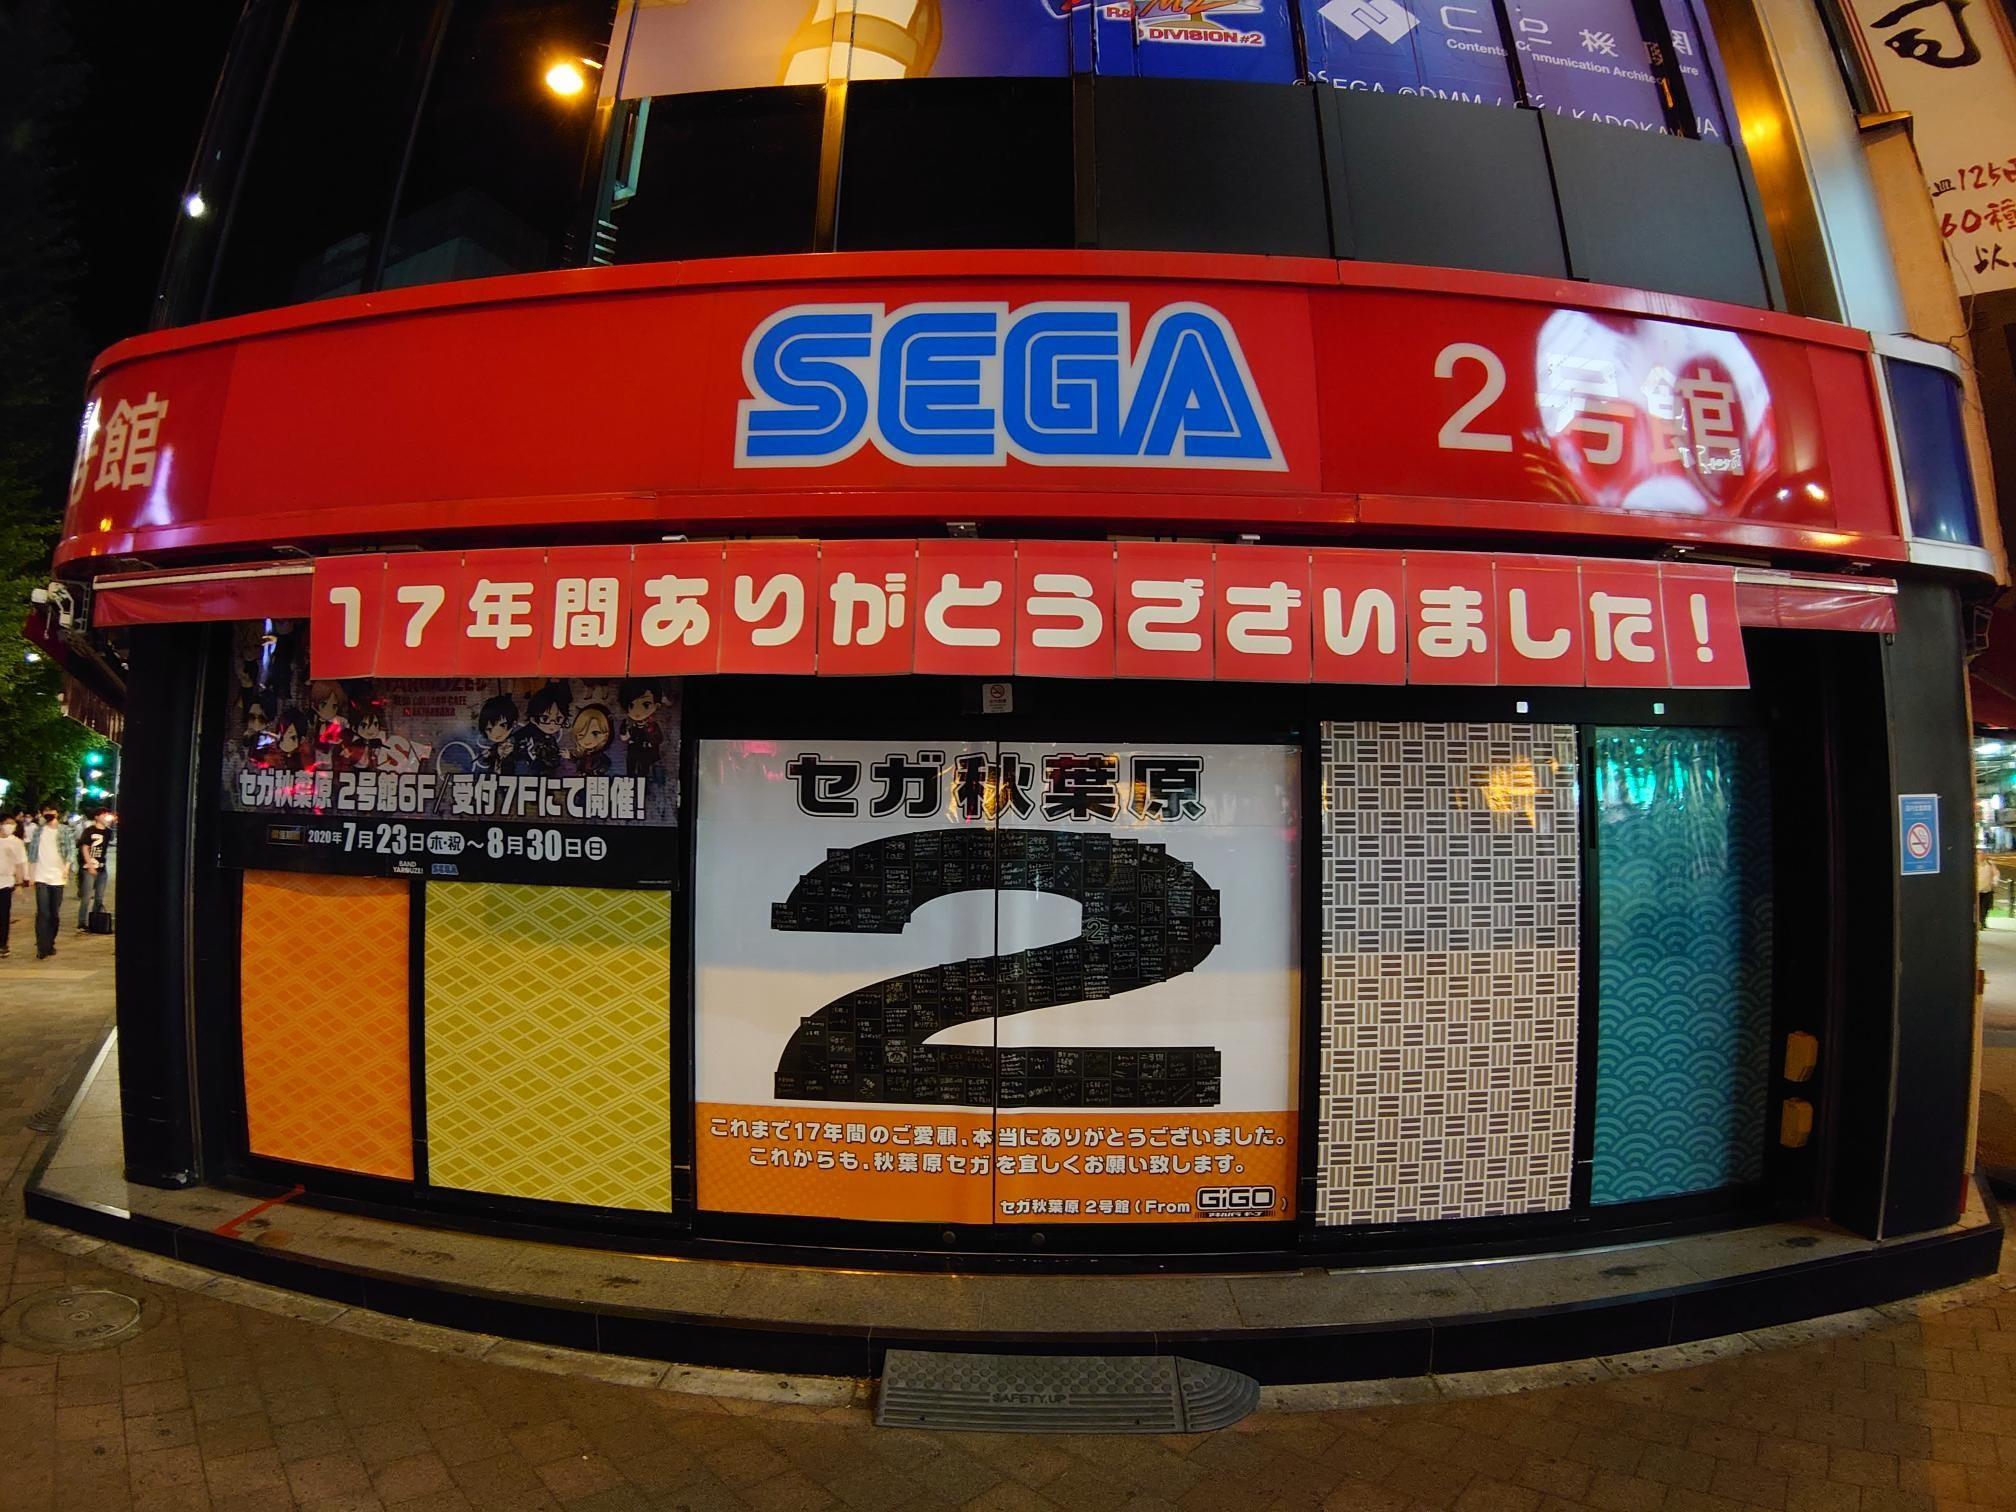 Edificio Sega Akihabara 2